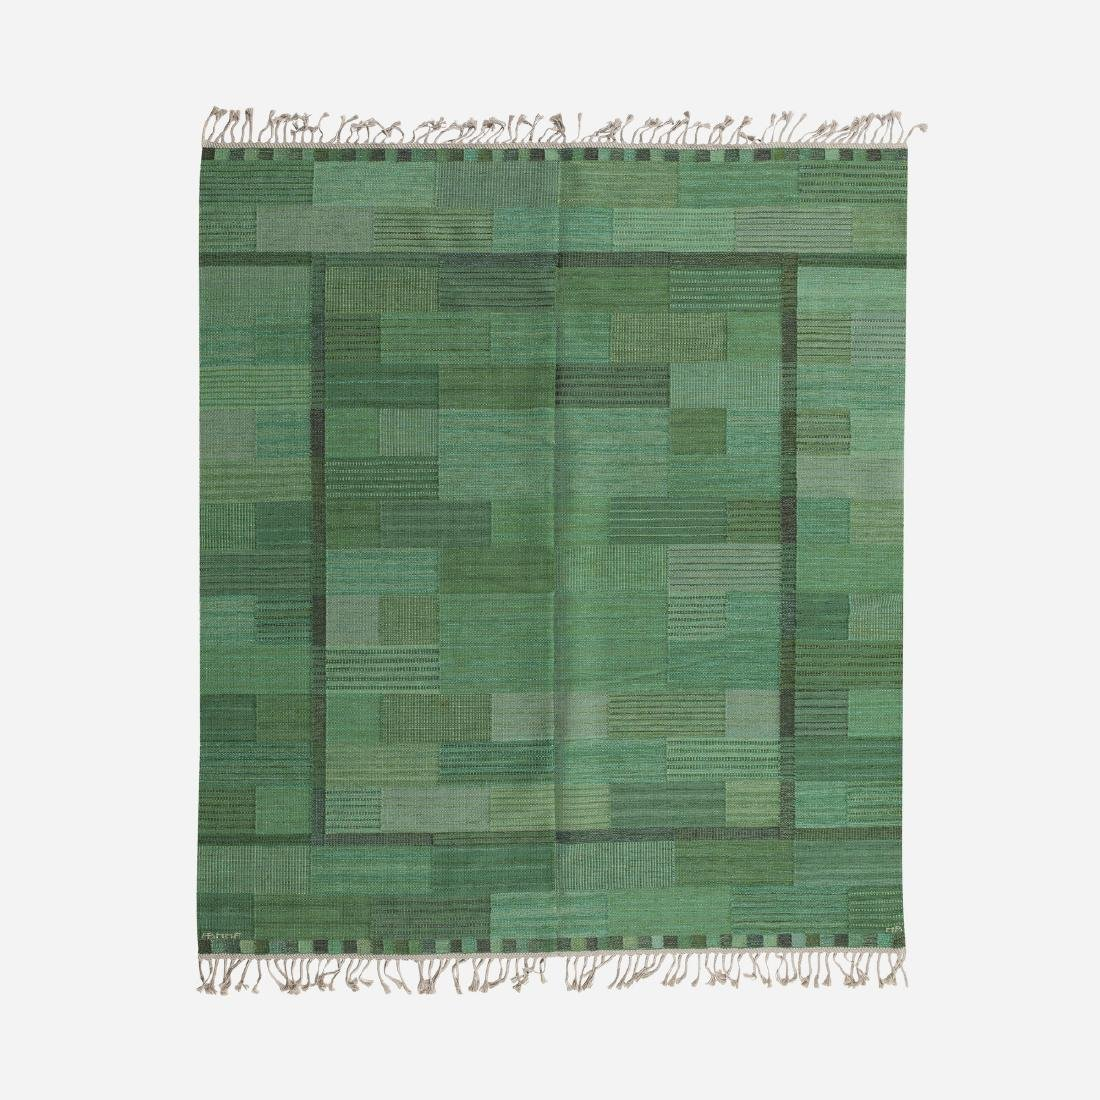 Marianne Richter, Fasad flatweave carpet